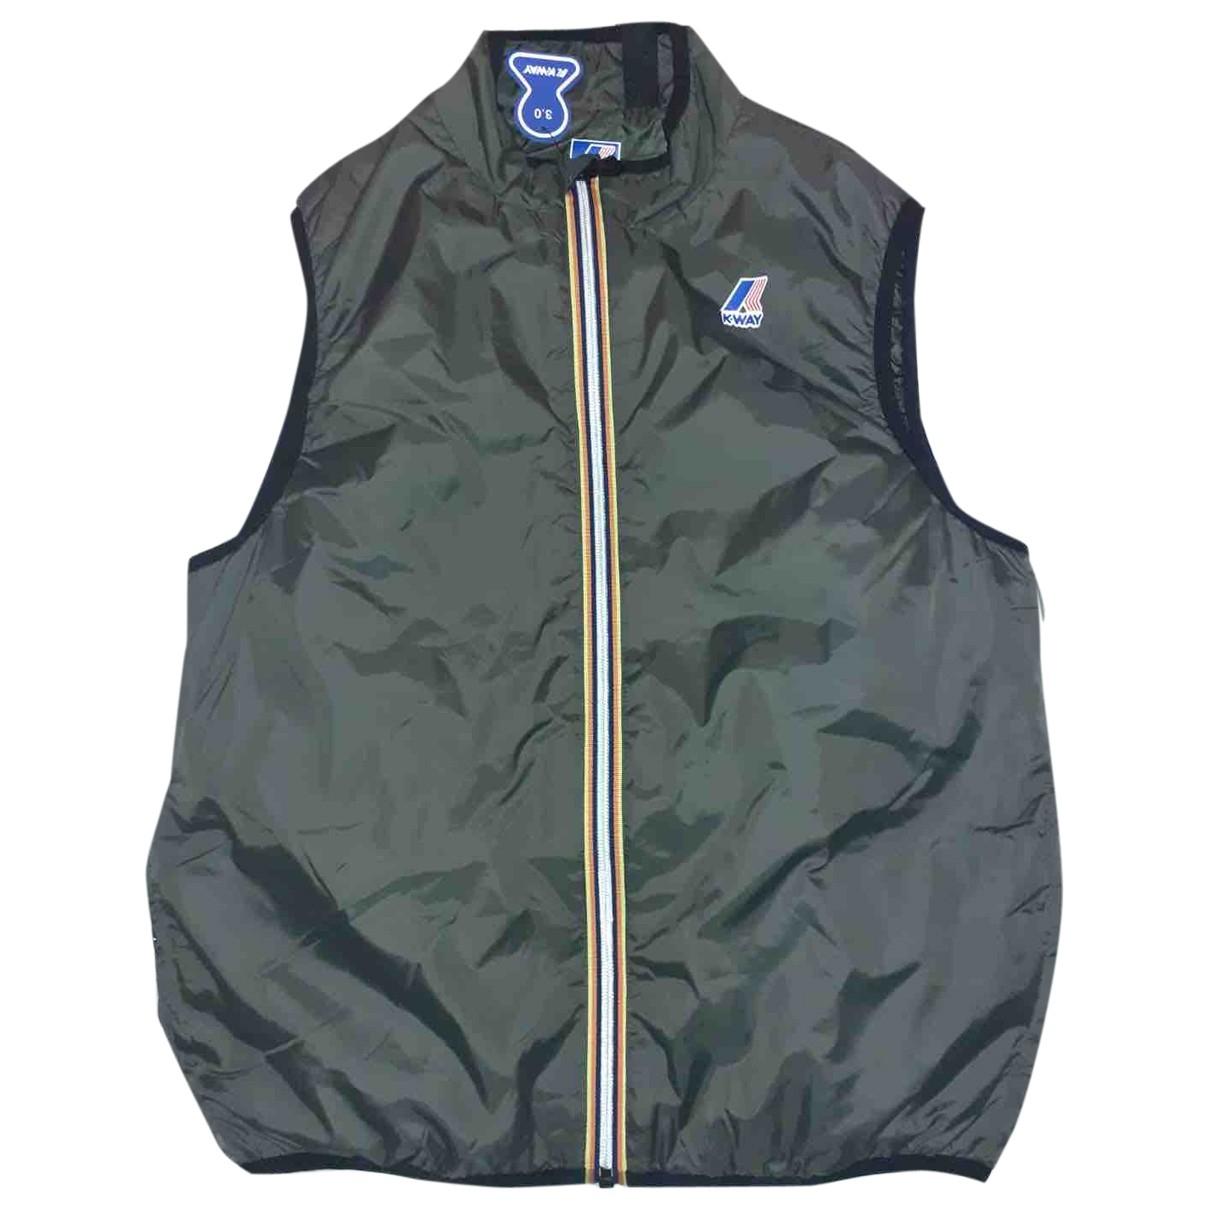 K-way \N jacket  for Men M International